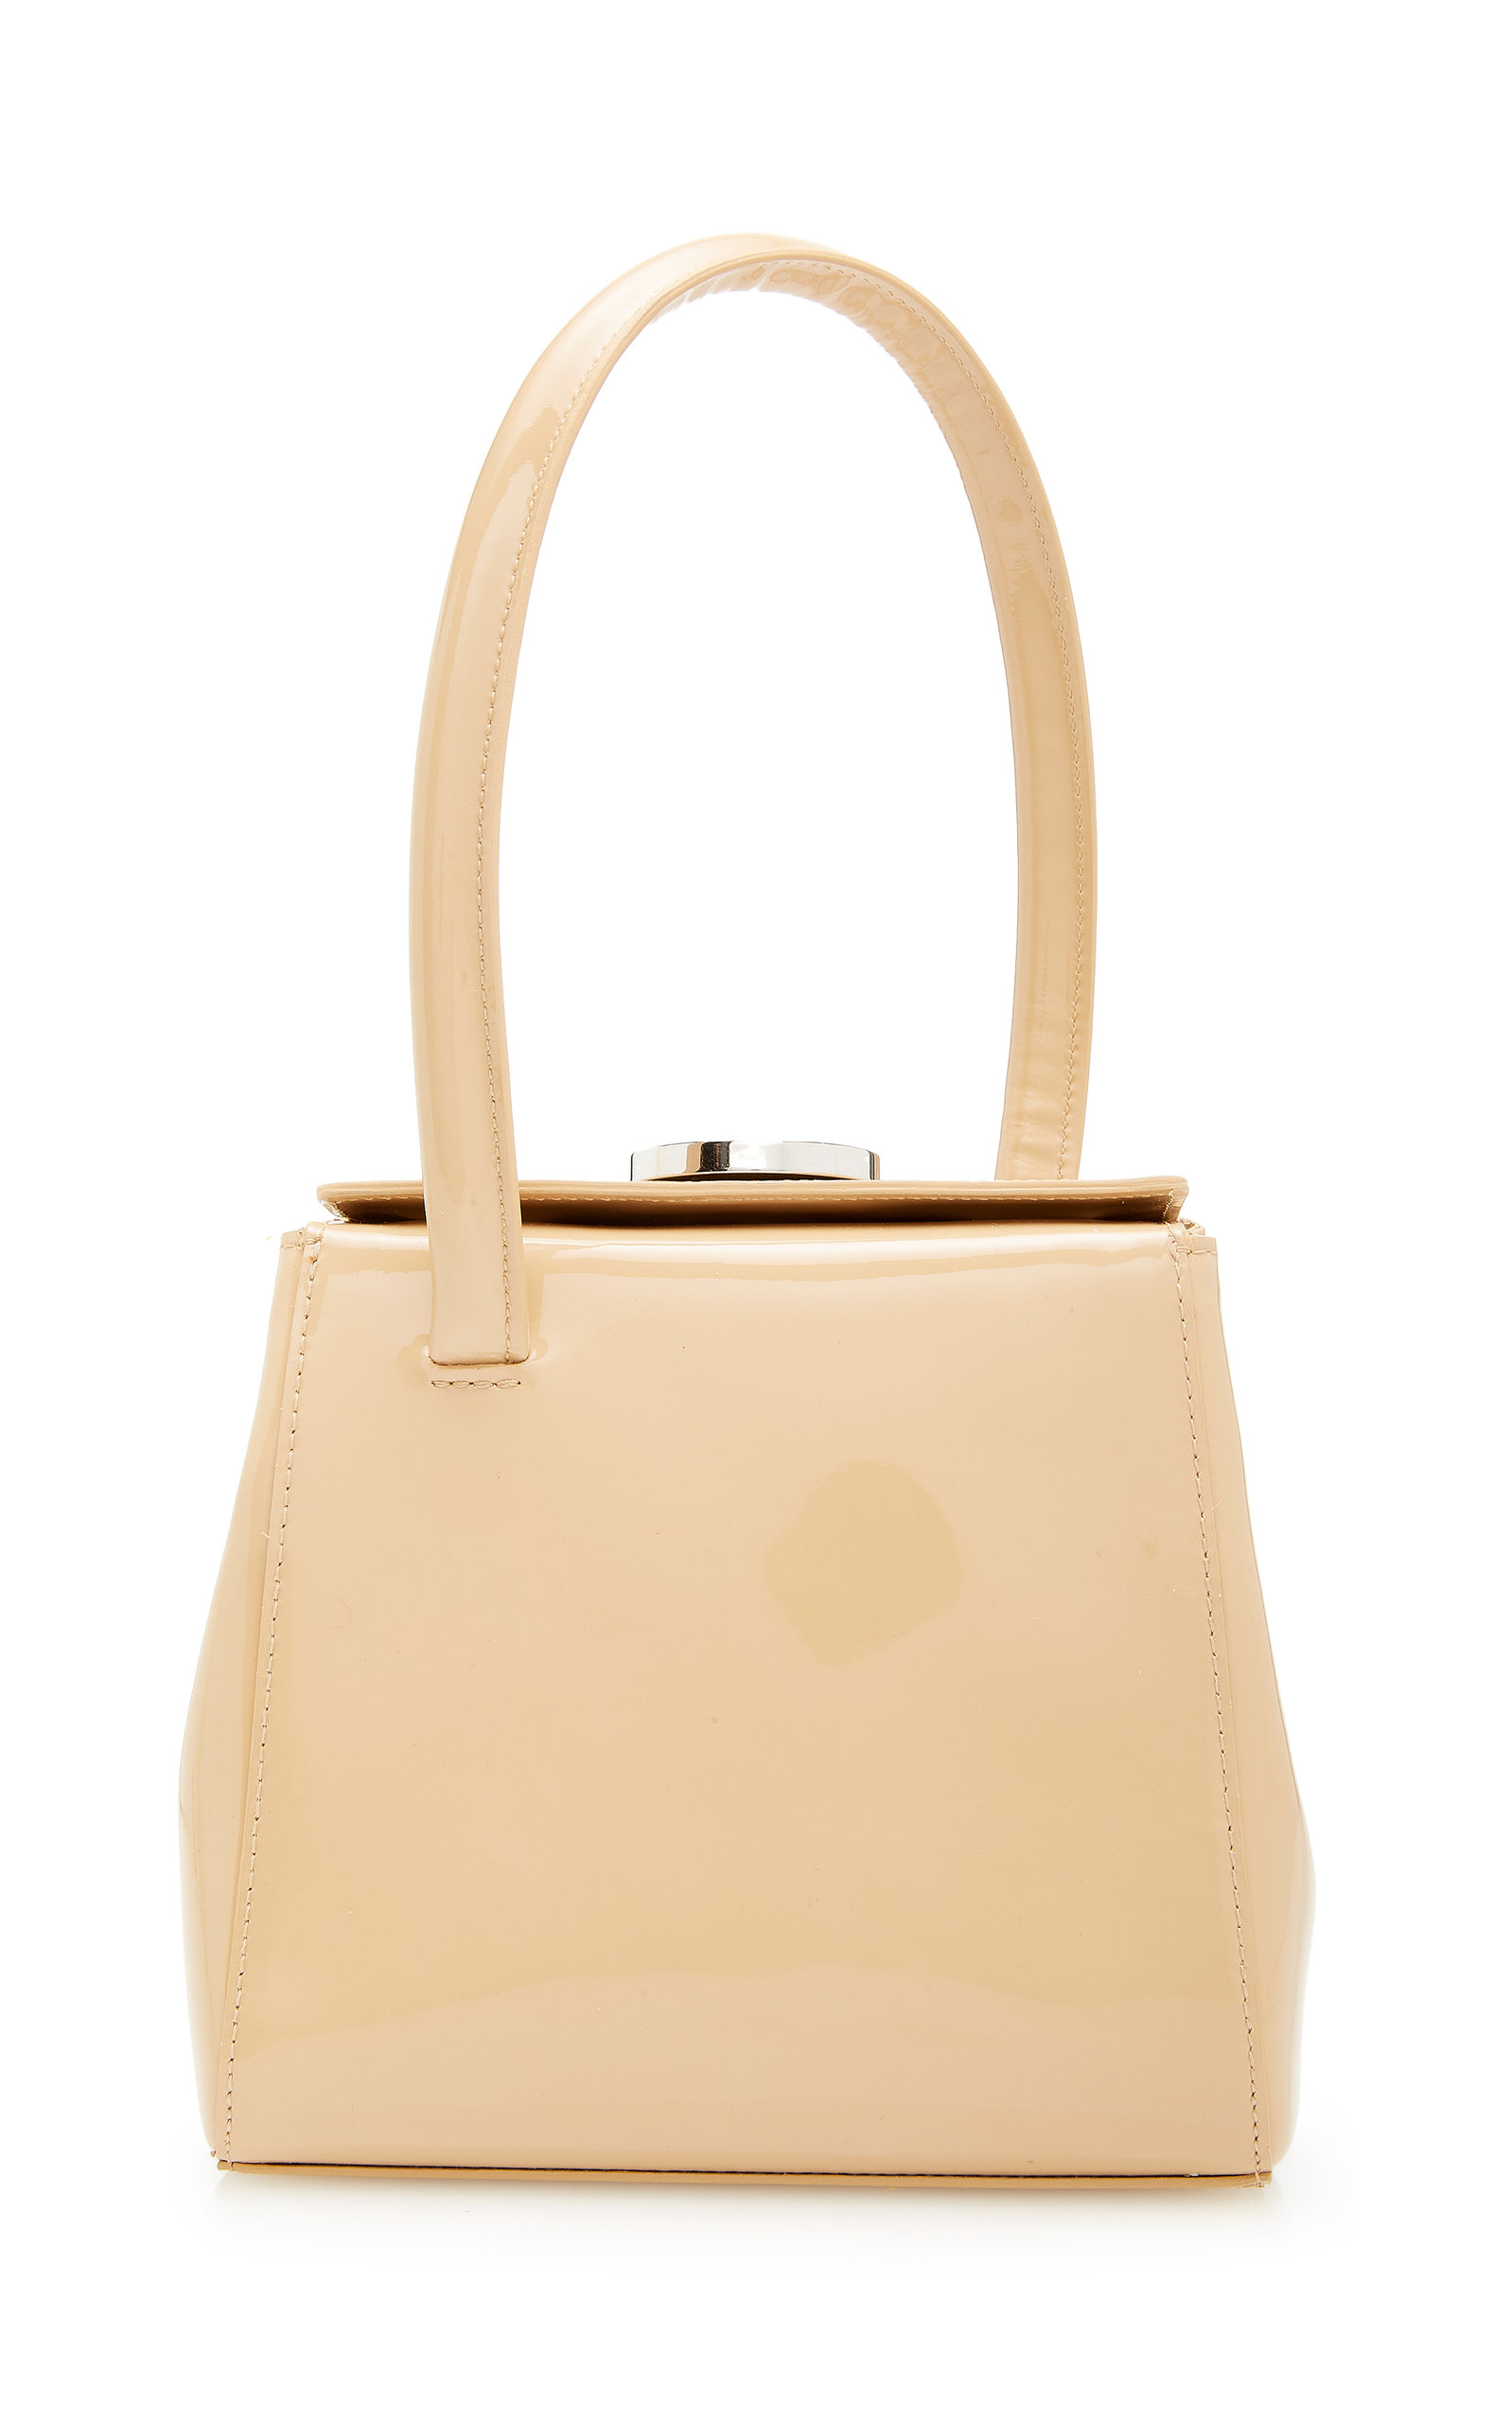 4479914fab79 Little LiffnerMademoiselle Patent Leather Bag. CLOSE. Loading. Loading.  Loading